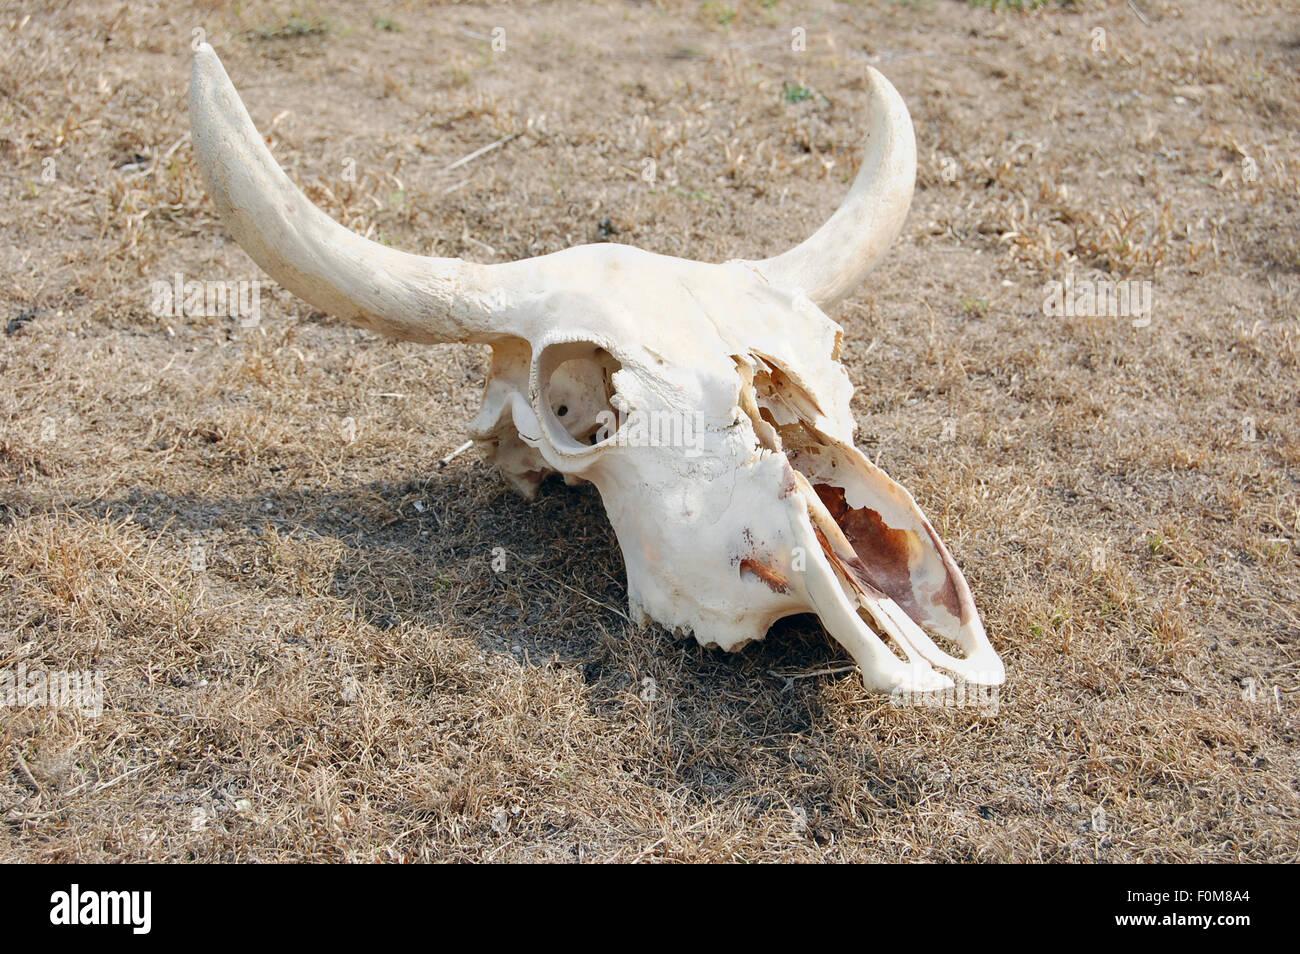 steer skull stock photos u0026 steer skull stock images alamy